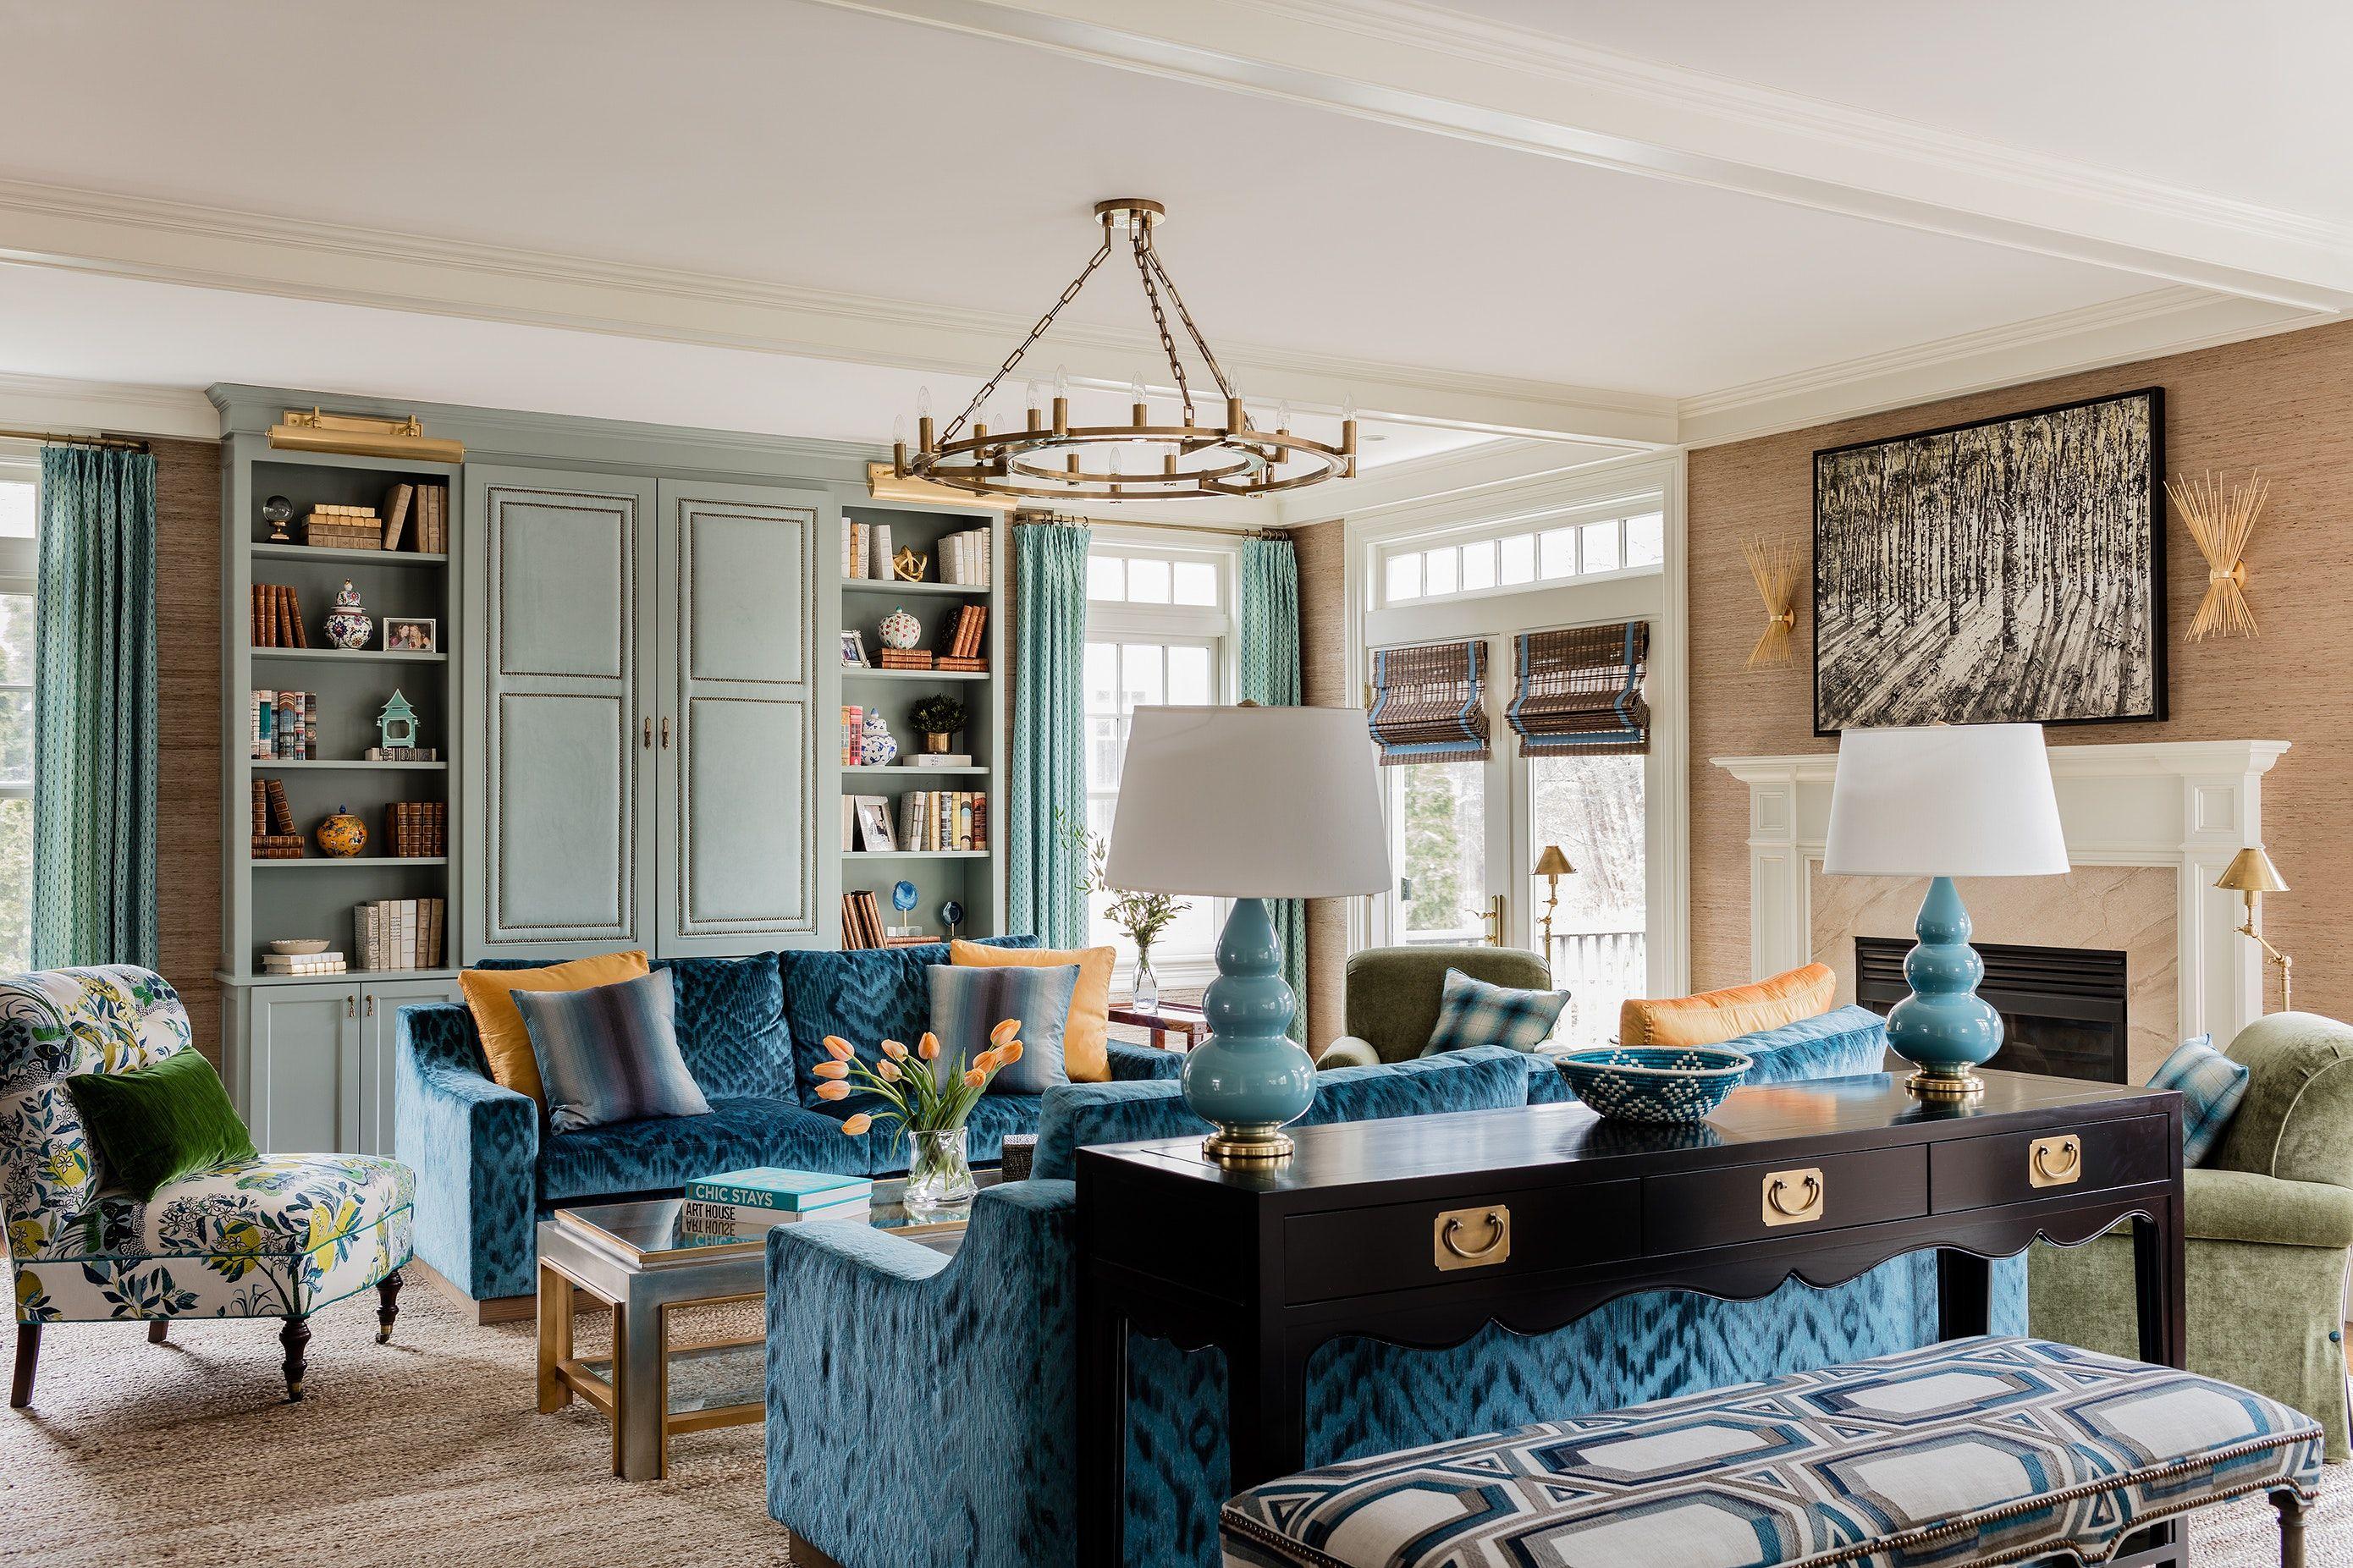 Living Room With Blue Velvet Matching Sofas And Robins Egg Built In Bookshelves Furniture Placement Living Room Furniture Buy Office Furniture